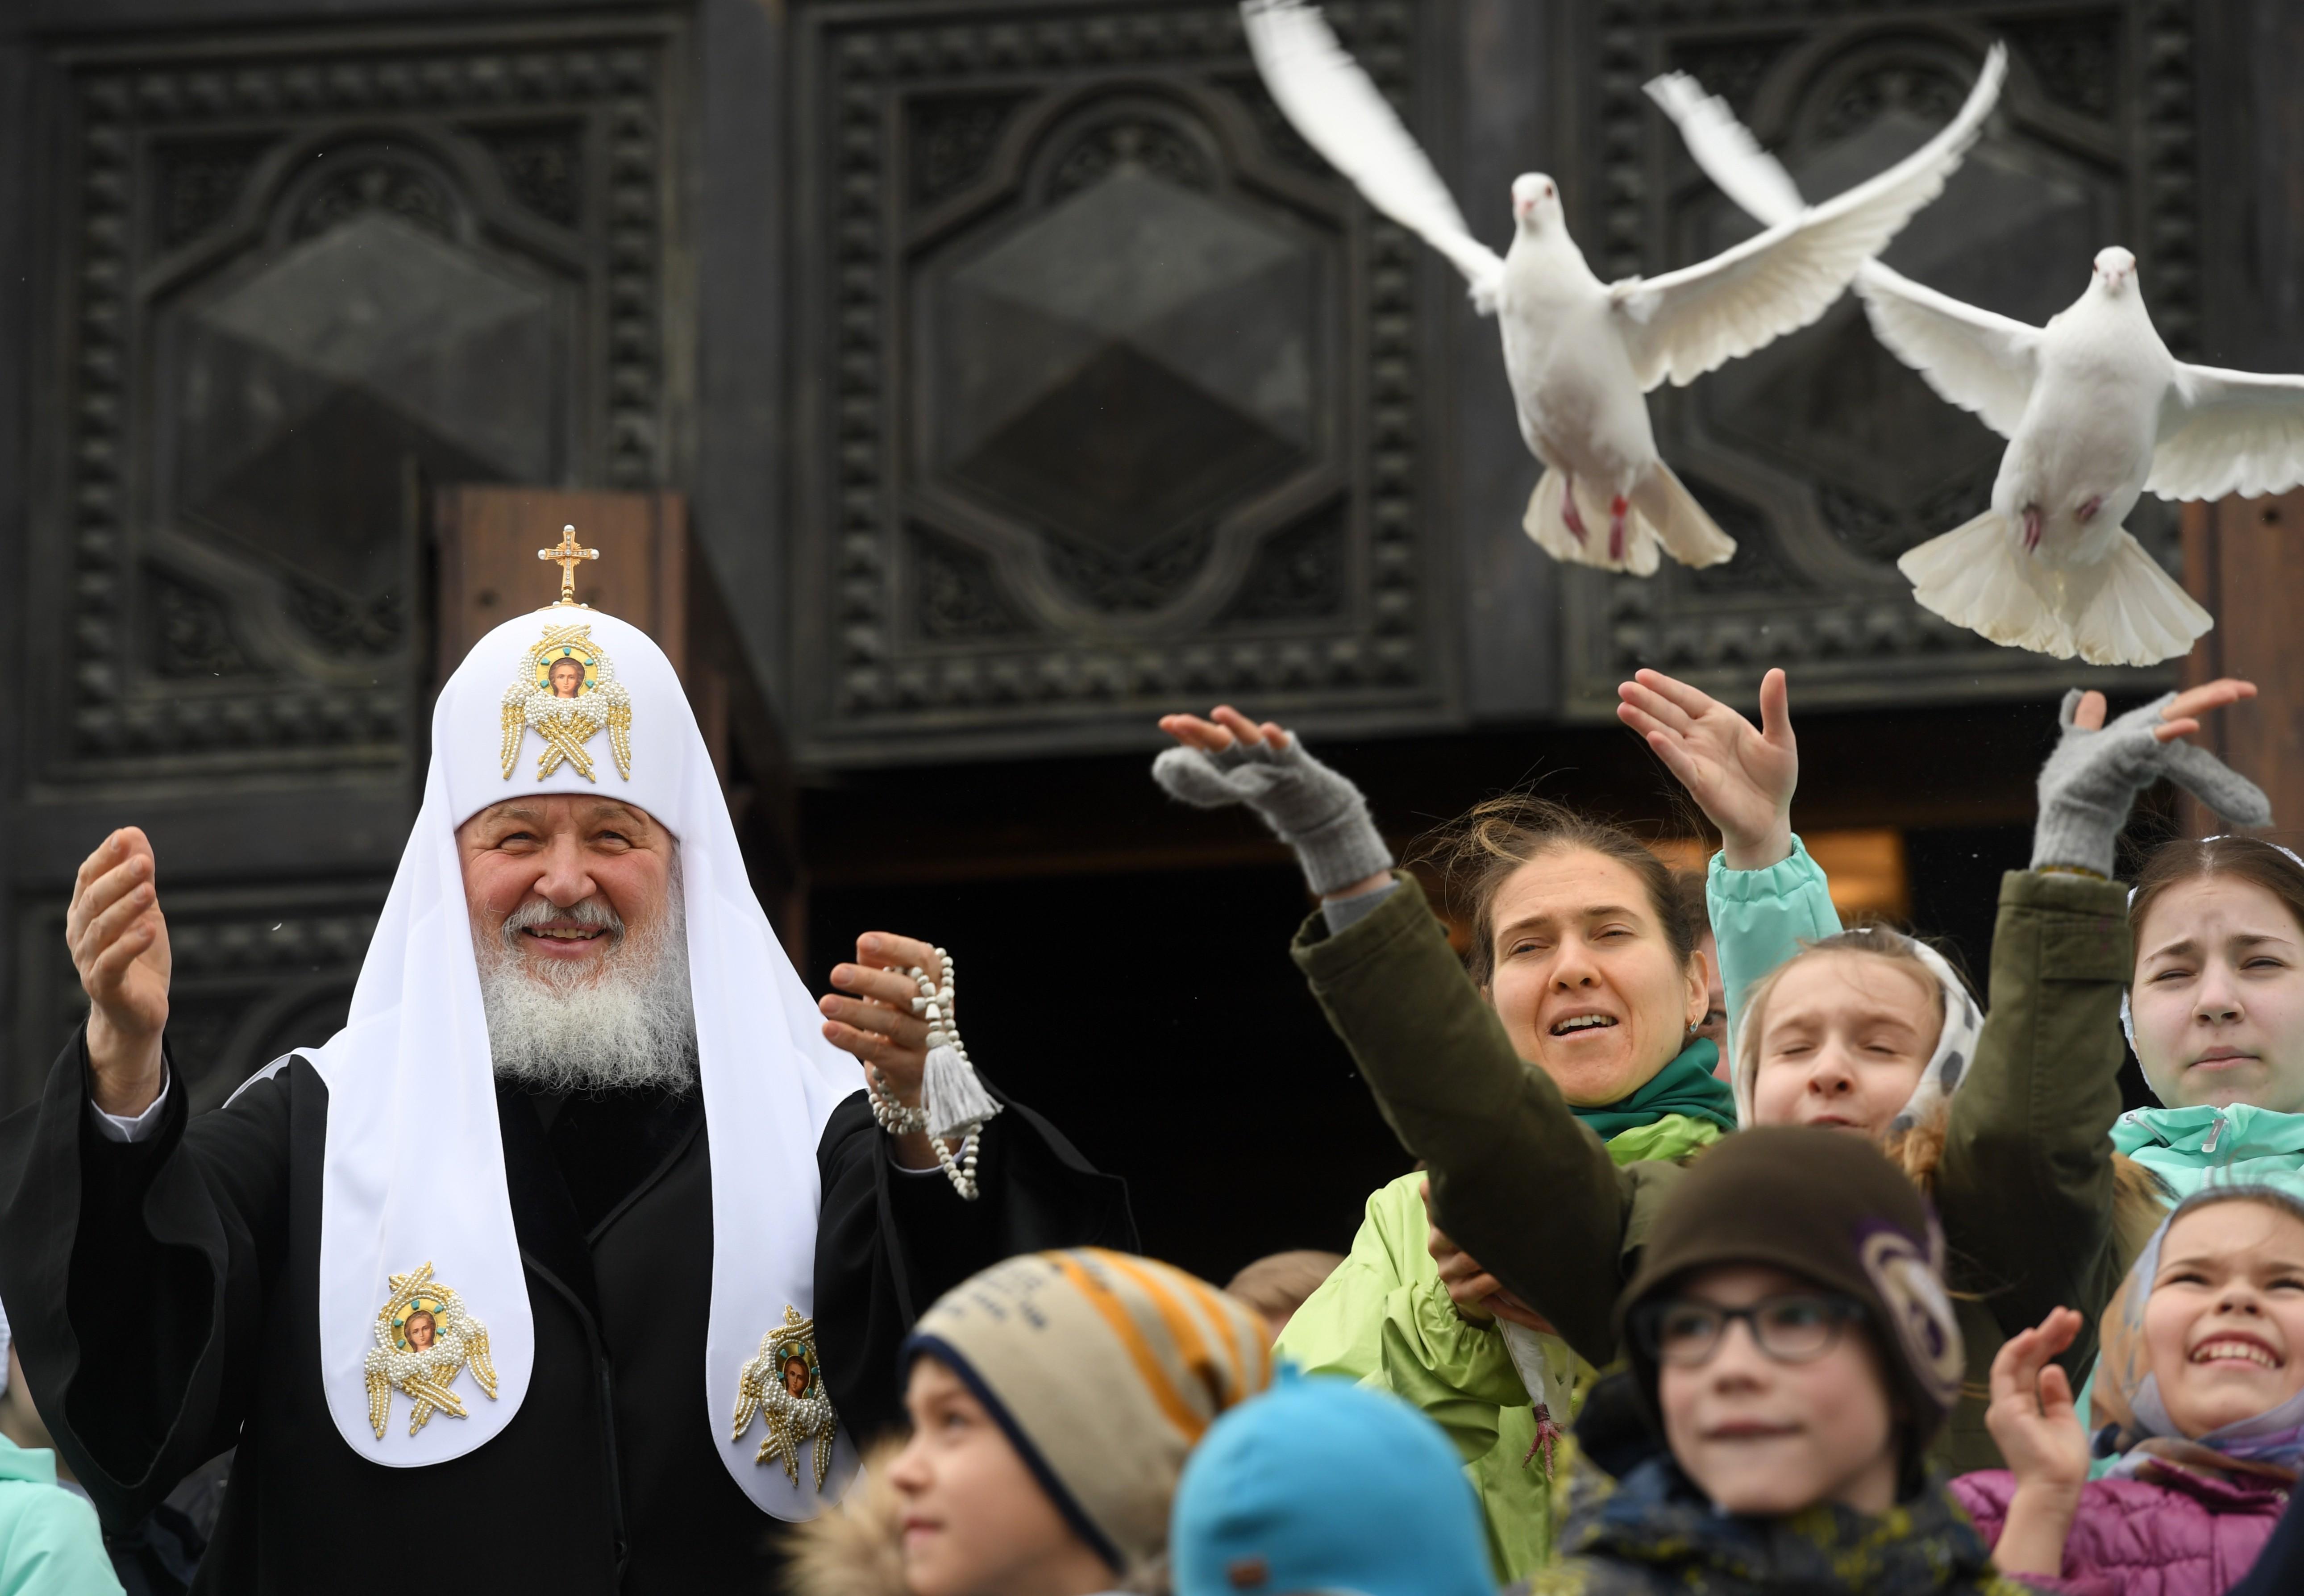 Богослужение в Страстную субботу в храме Христа Спасителя. Фото: © РИА Новости / Евгений Биятов